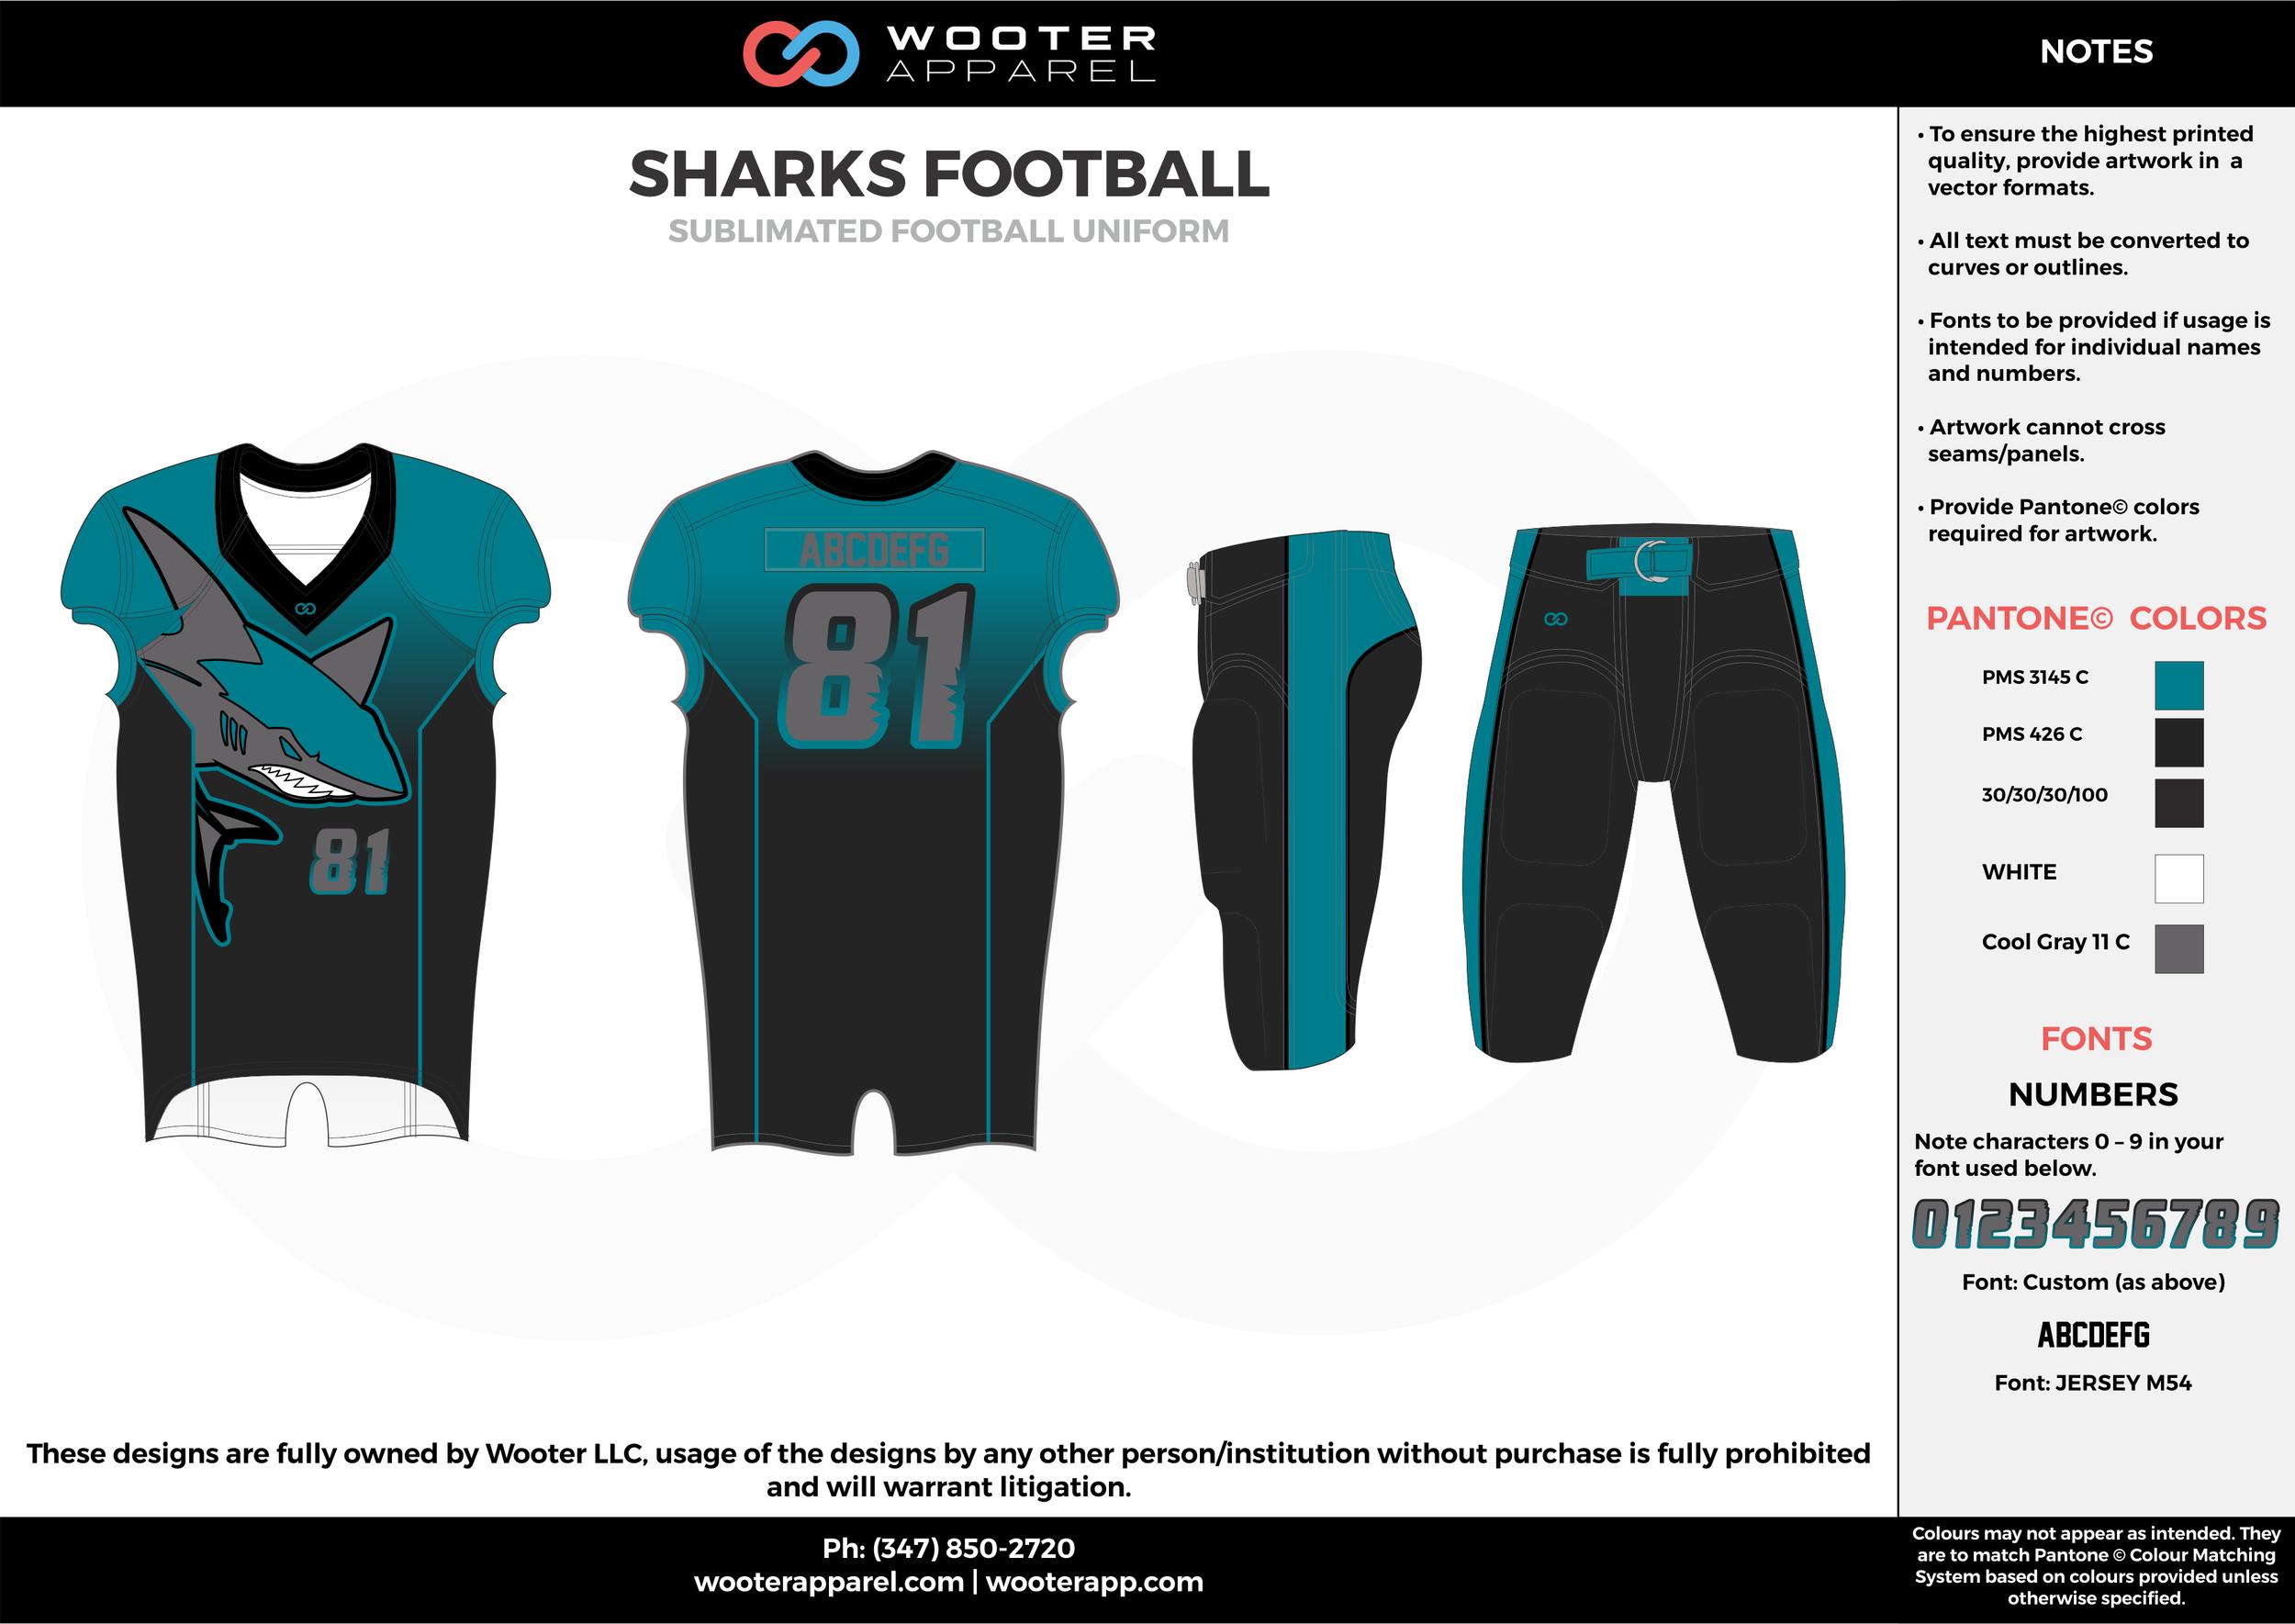 SHARKS FOOTBALL water blue black gray football uniforms jerseys pants